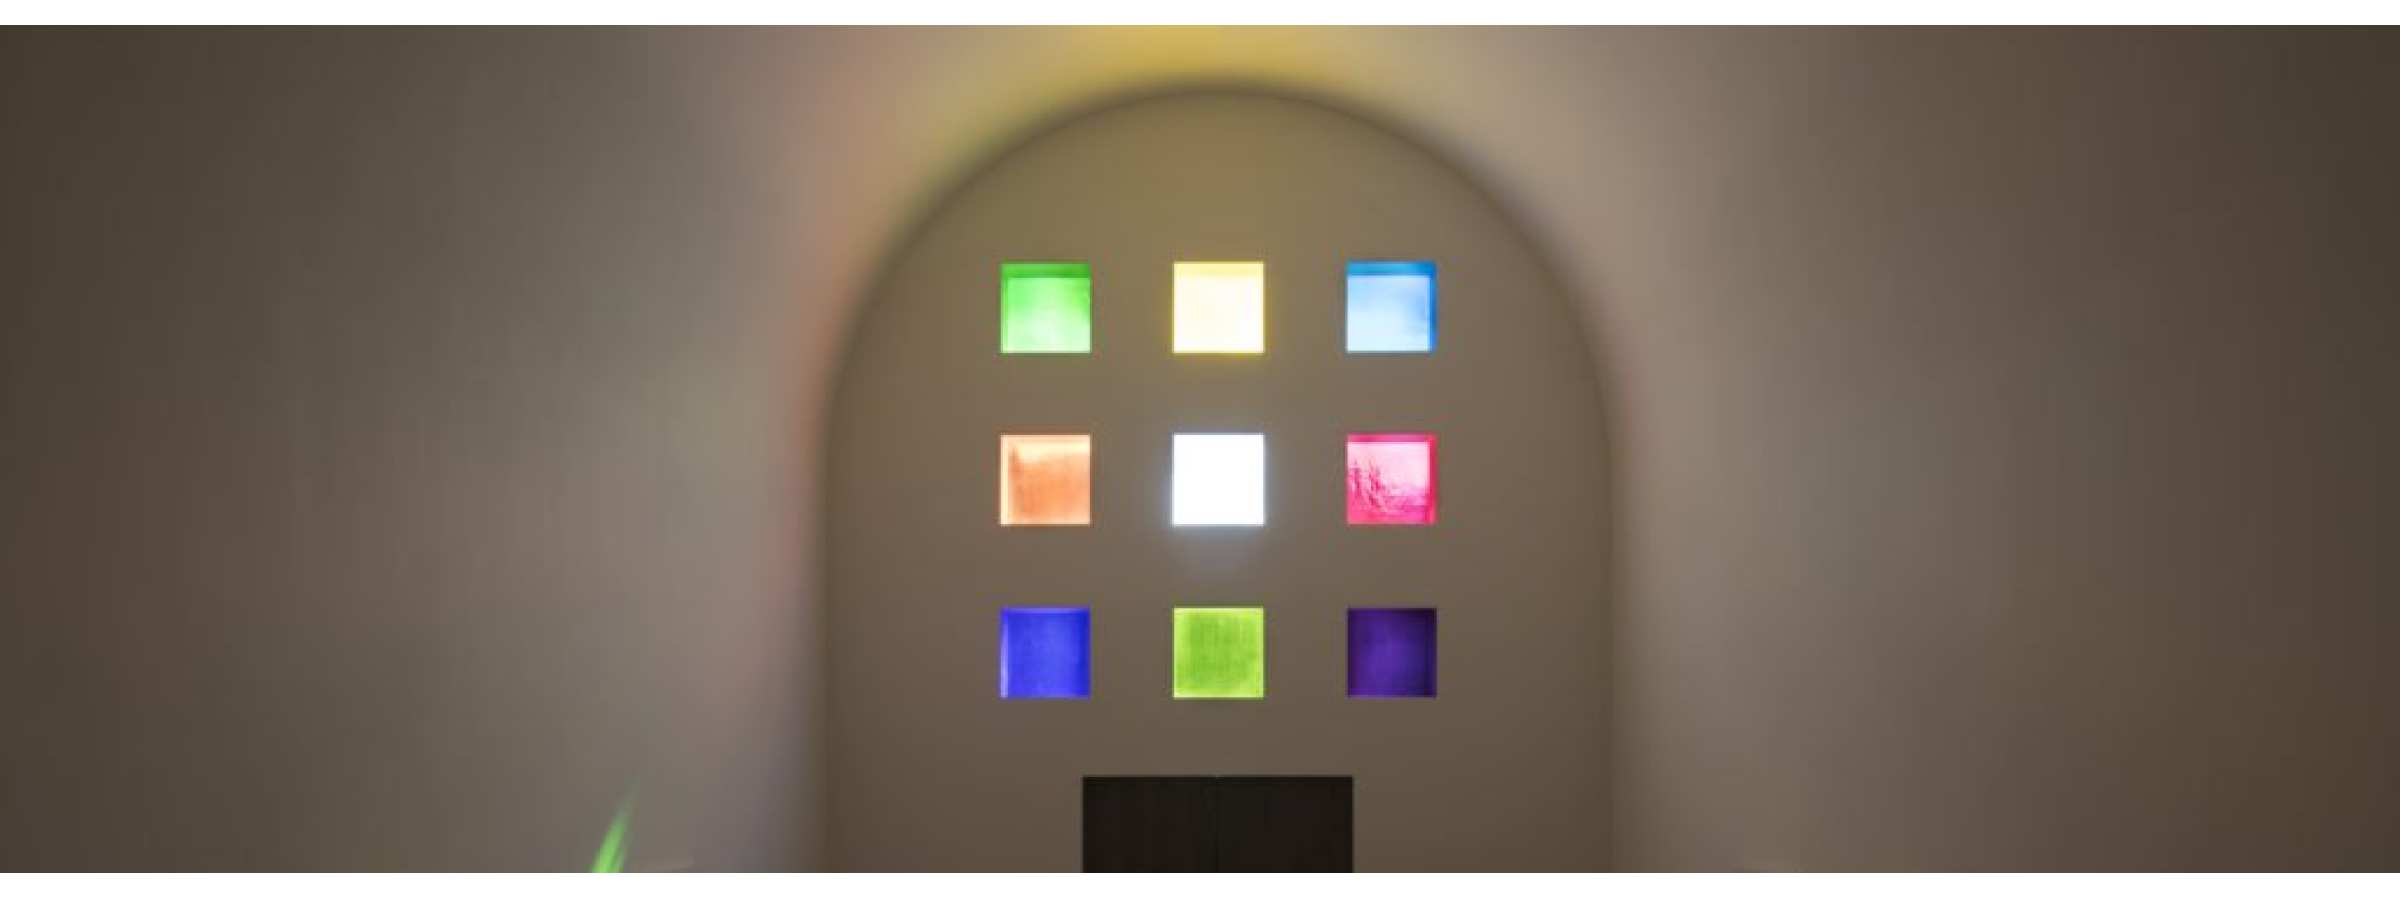 Ellsworth Kelly, Austin (2015). Interior view, facing south. © Ellsworth Kelly Foundation. Photo courtesy of the Blanton Museum of Art, The University of Texas at Austin.